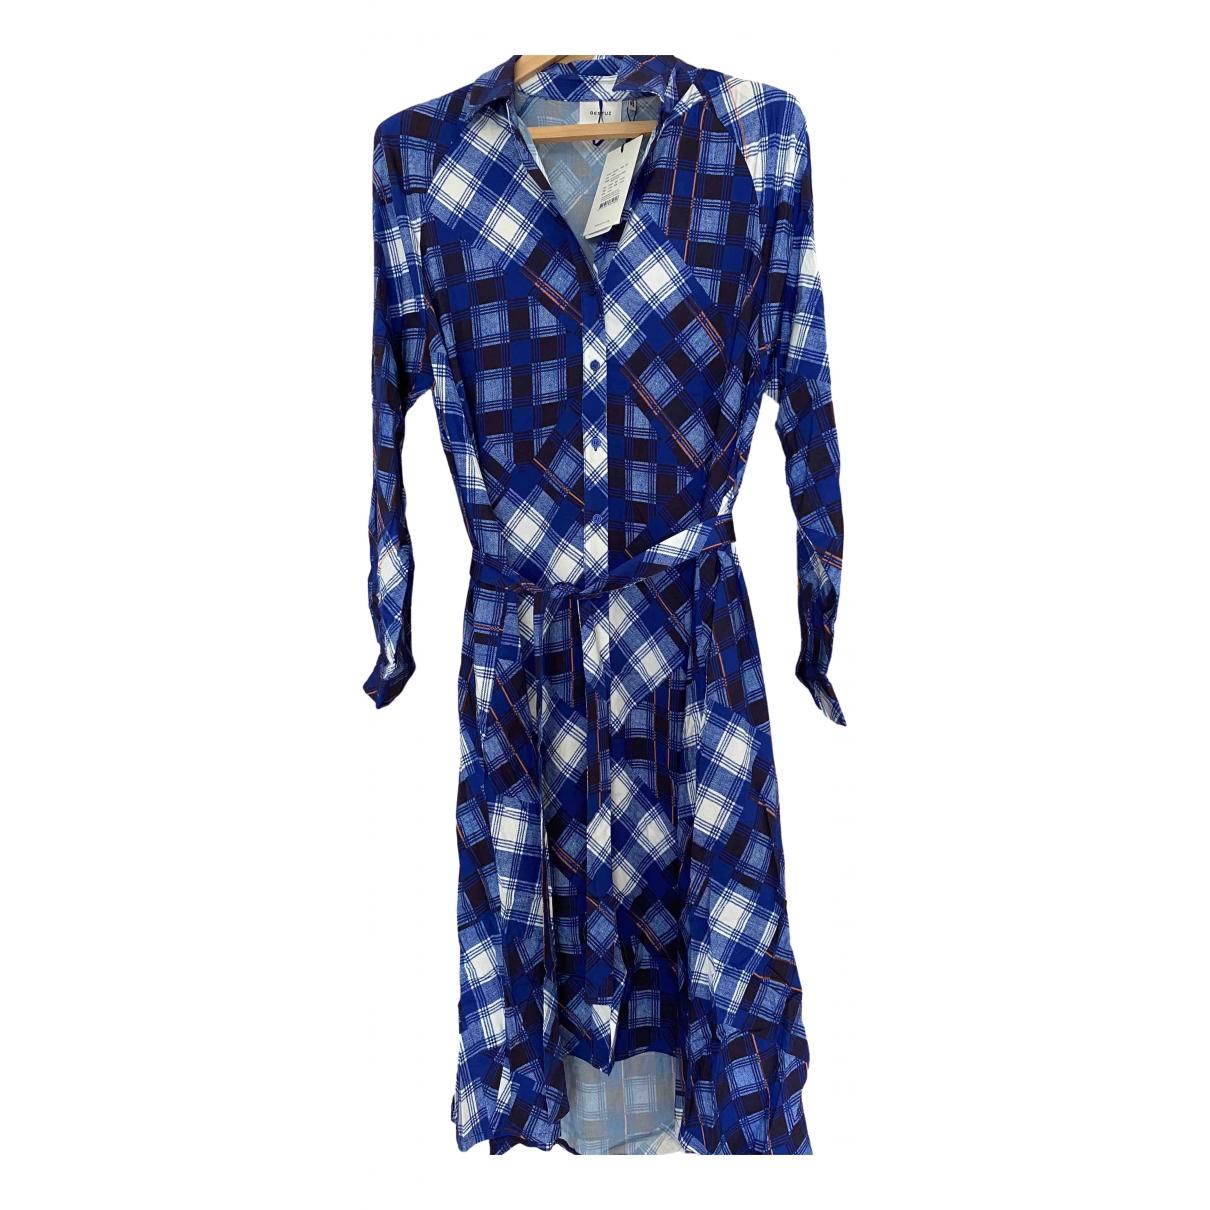 Gestuz \N Blue dress for Women 38 FR